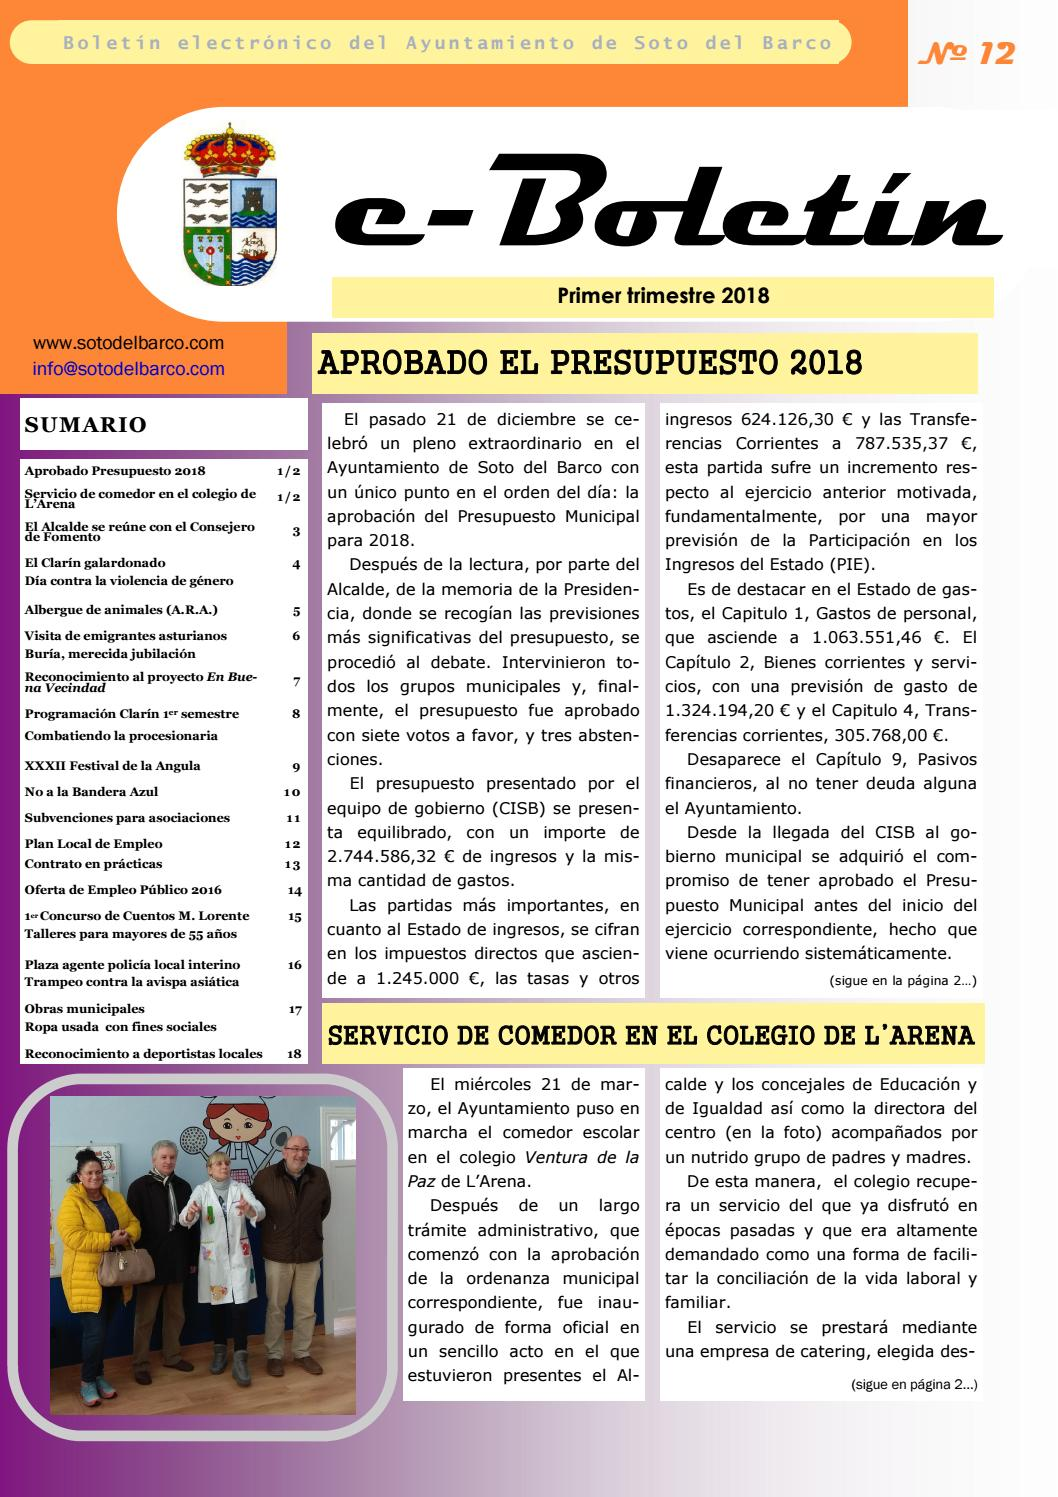 E Boletin 12 By Ayuntamiento De Soto Del Barco Issuu